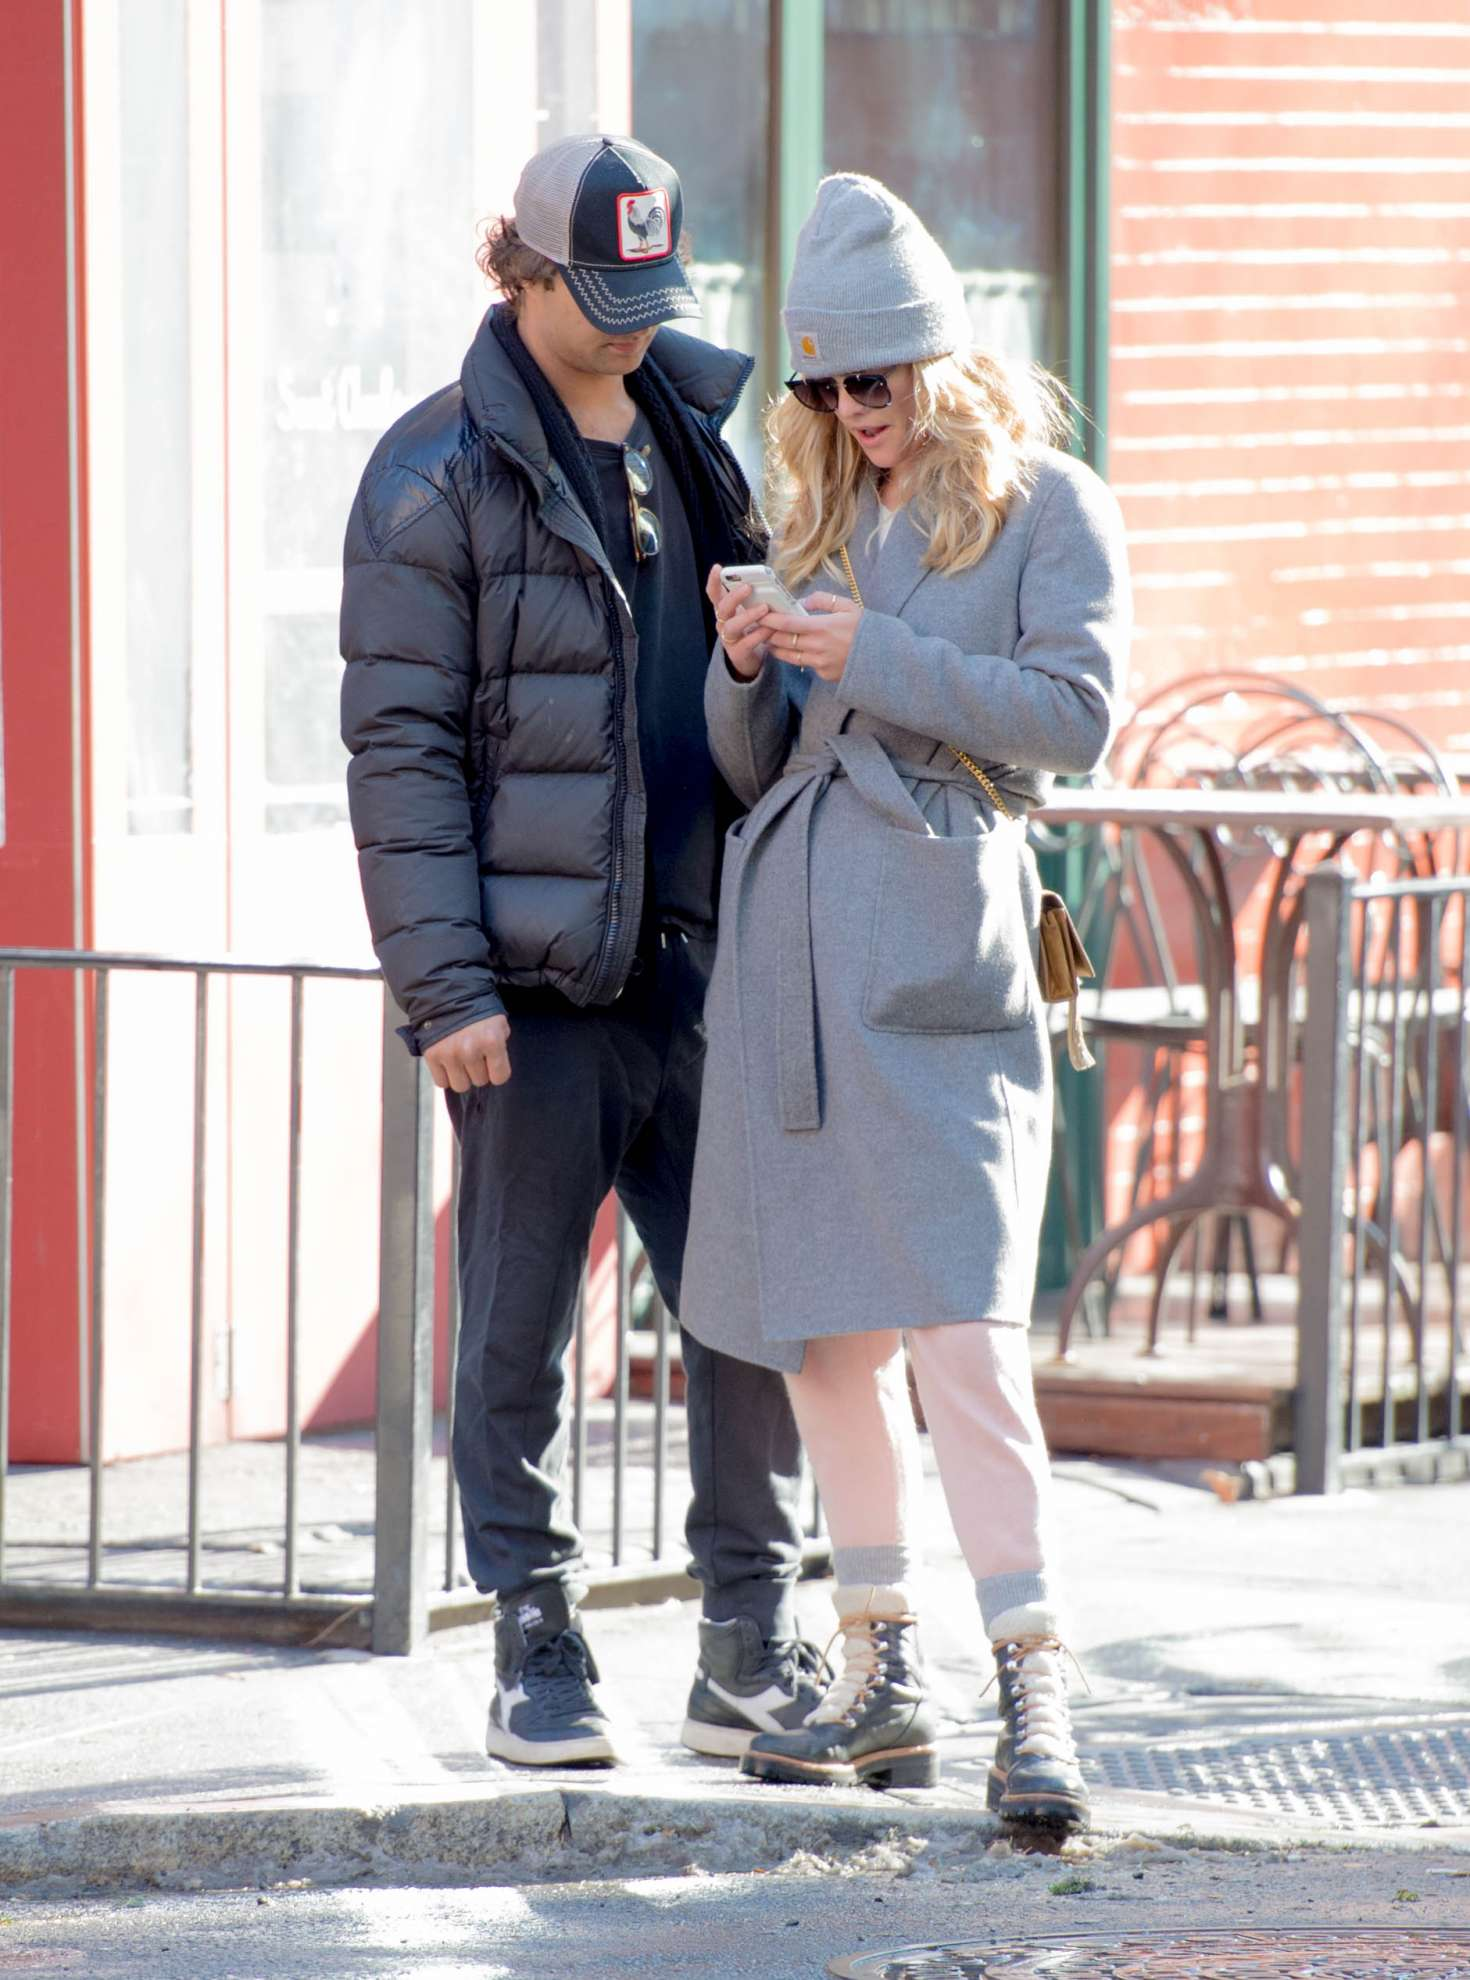 Nina Agdal 2018 : Nina Agdal: Shopping with boyfriend Jack Brinkley-Cook -10